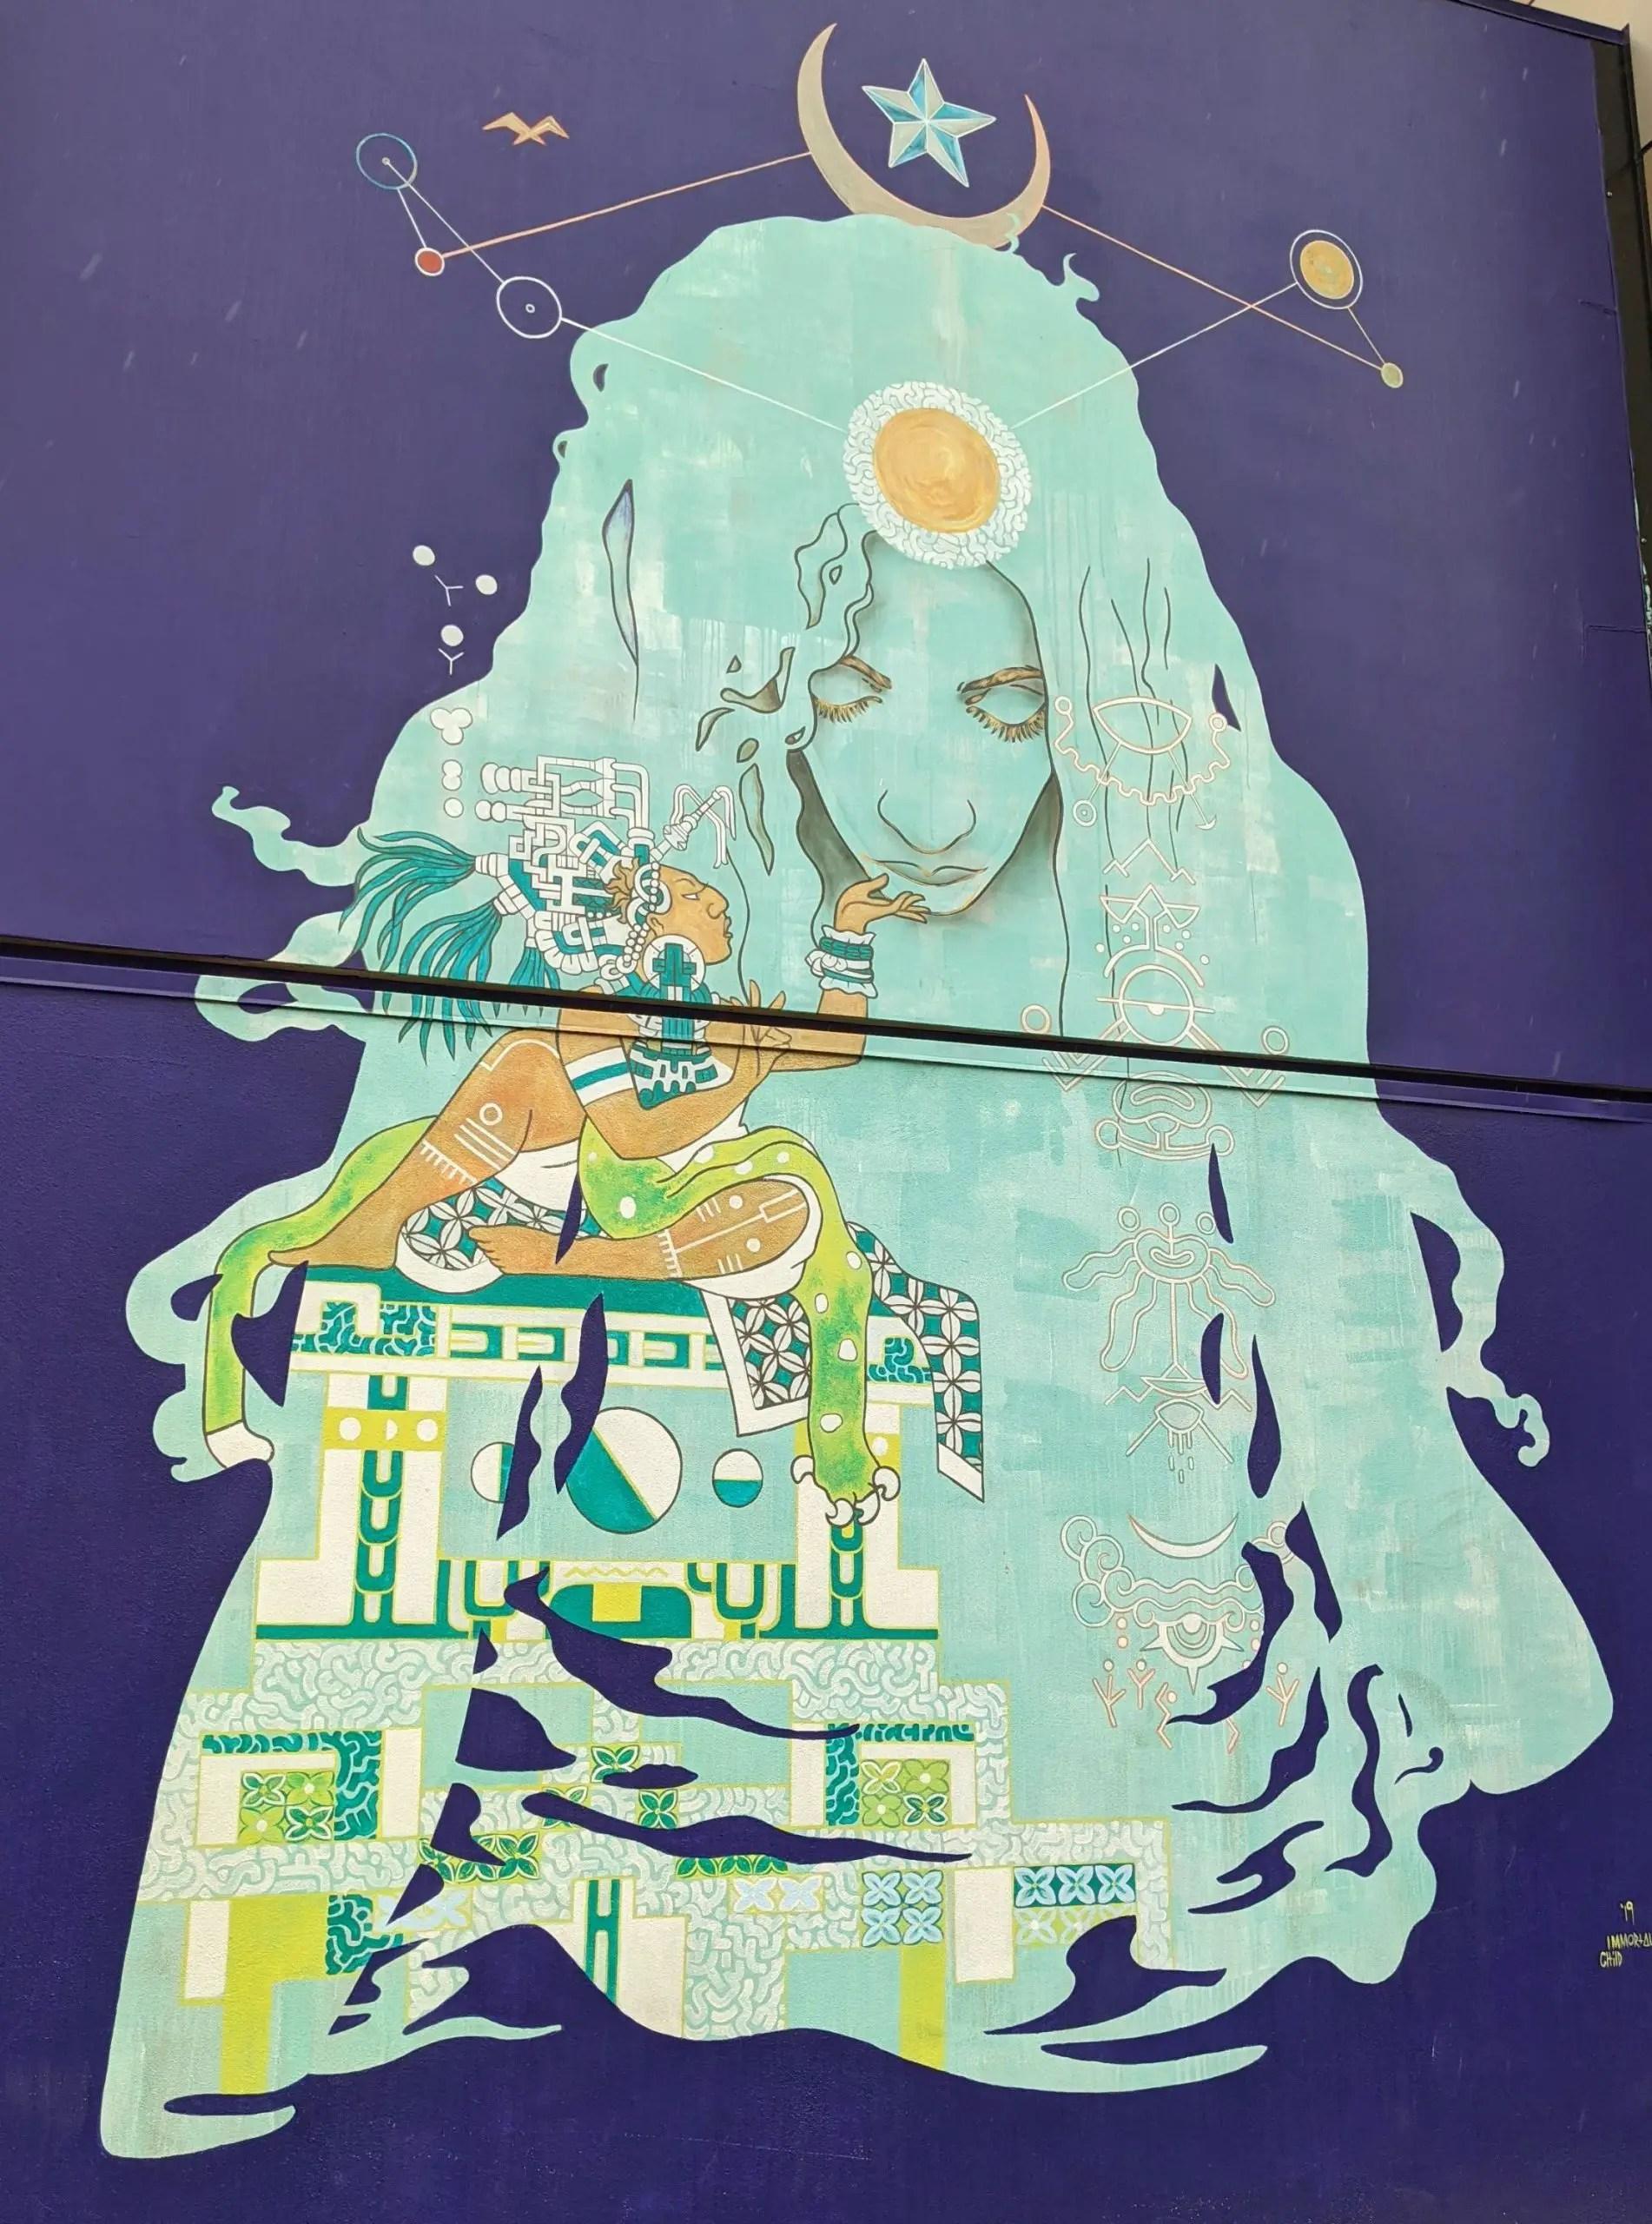 Street art in Hamilton - things to do in Hamiton